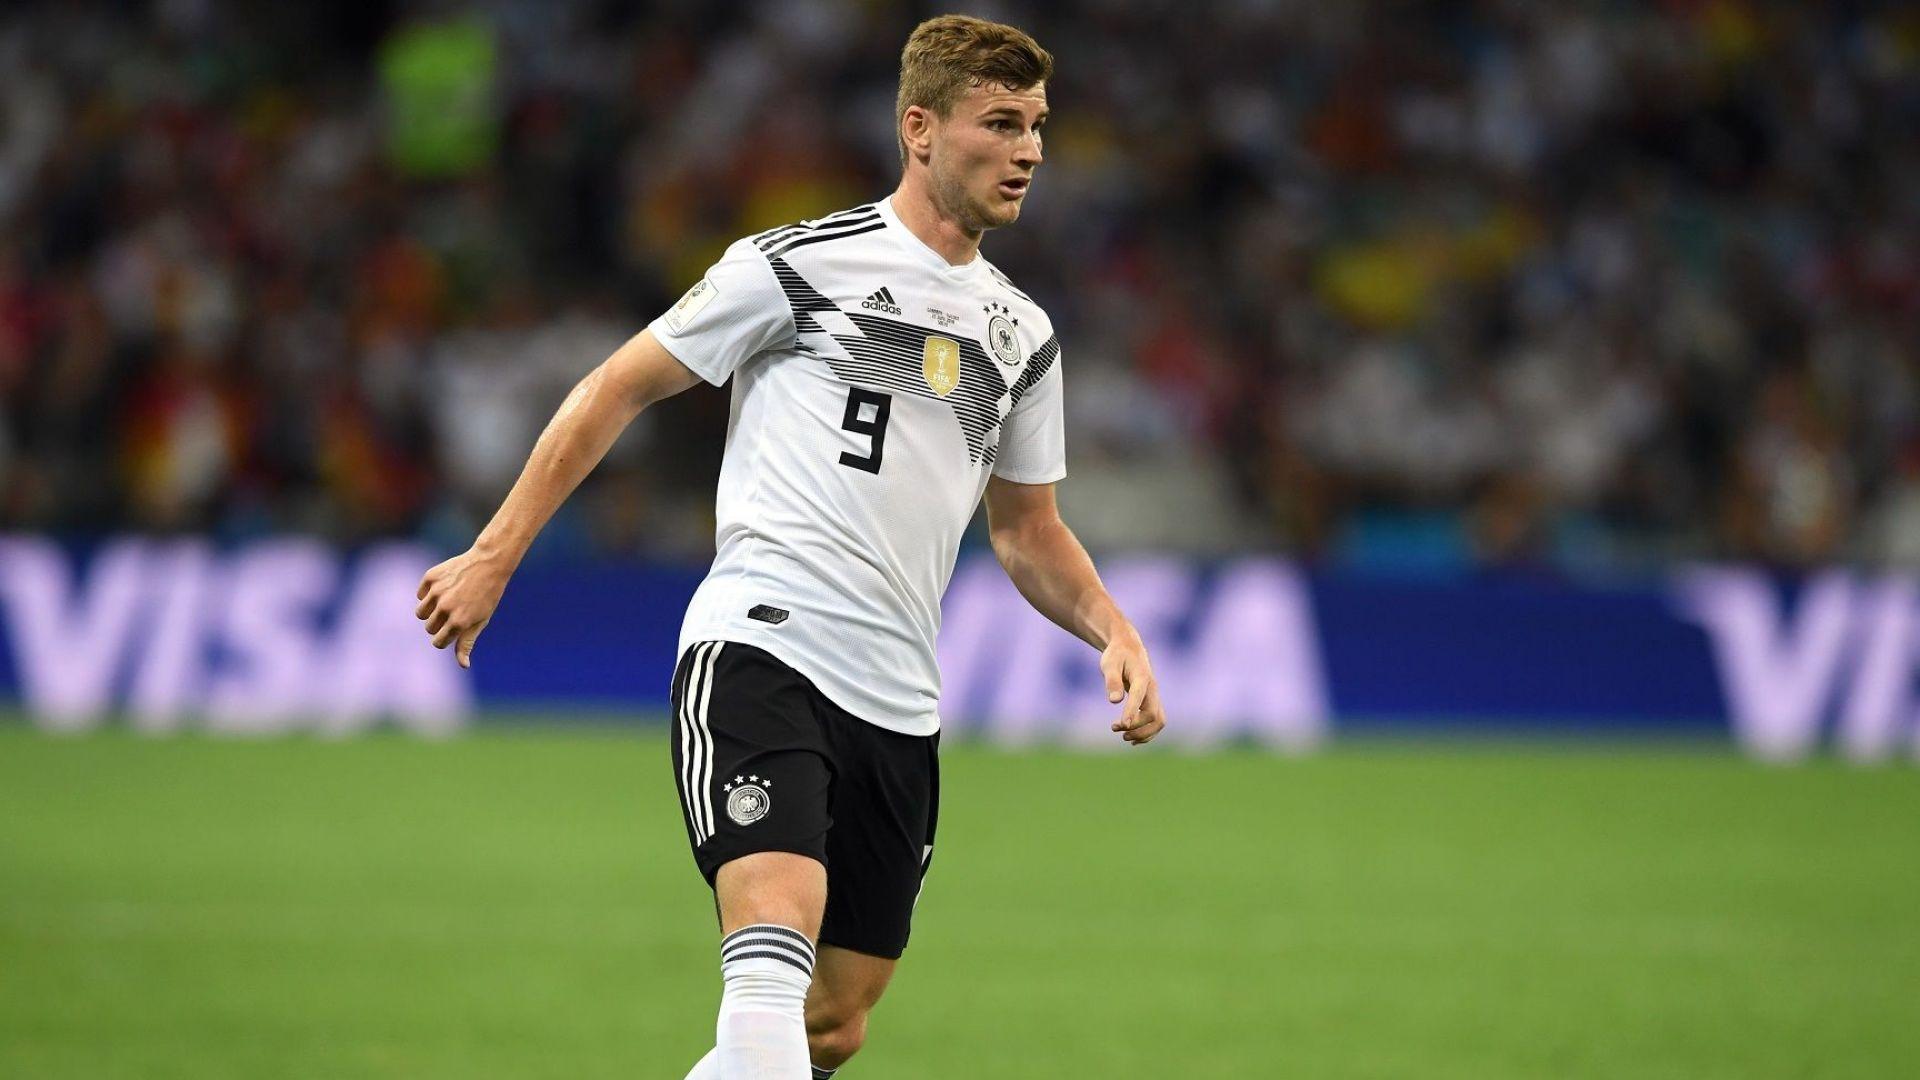 Челси се похвали, подписва с немския национал Тимо Вернер